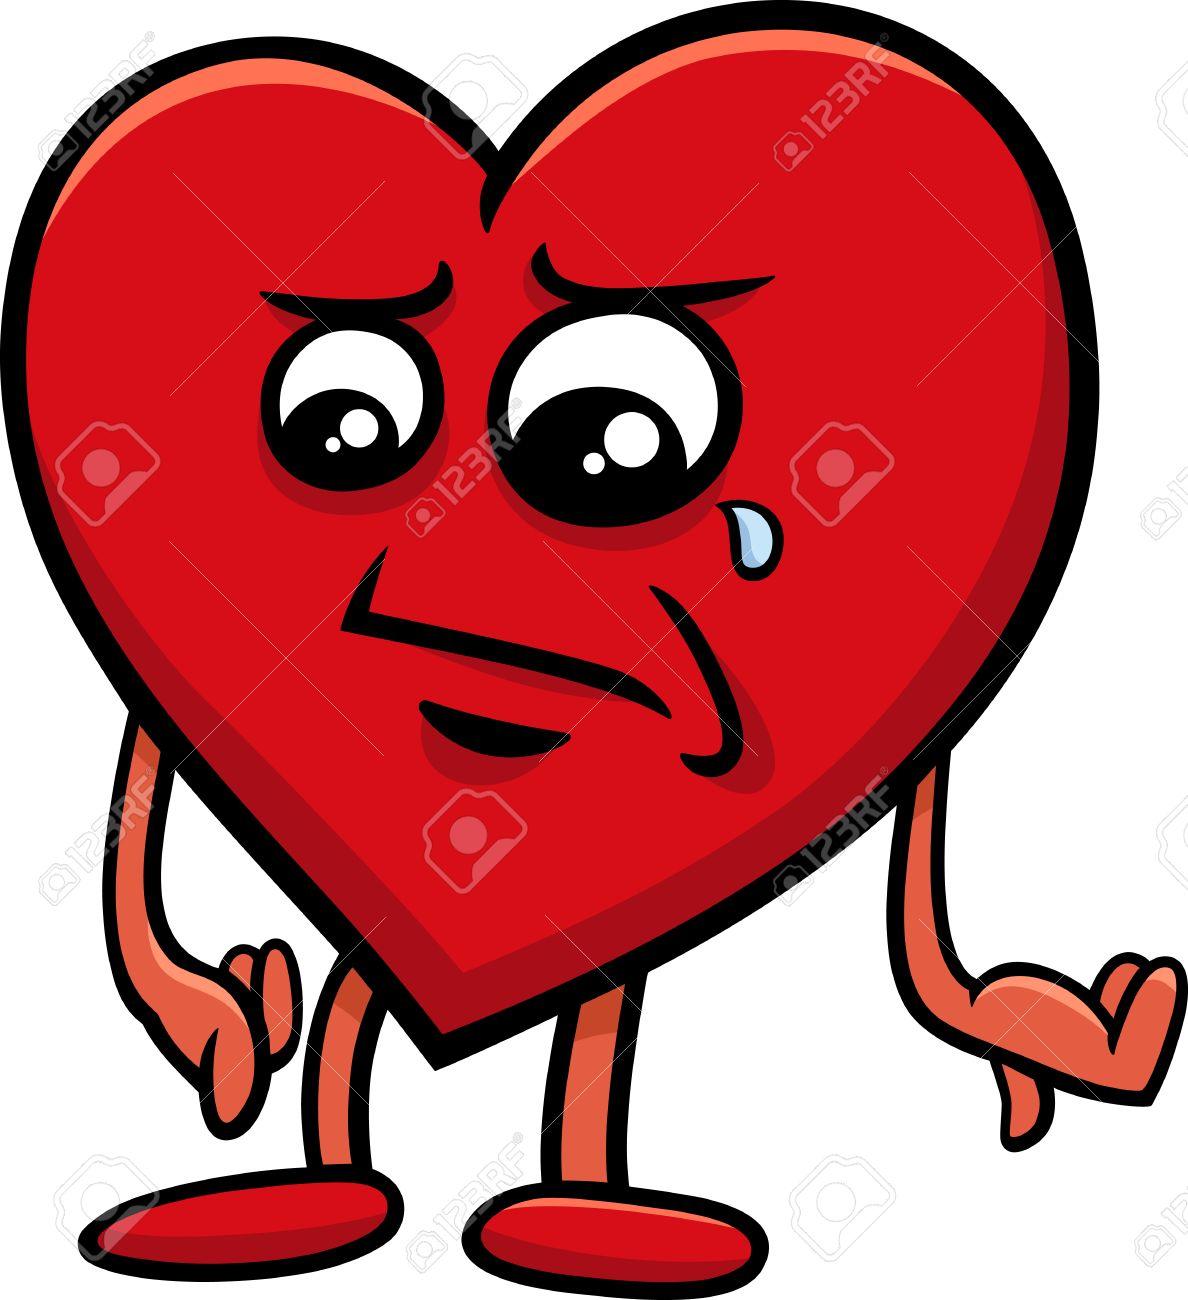 Cartoon Illustration Of Sad Heart Character On Valentine Day Stock Vector    47171069